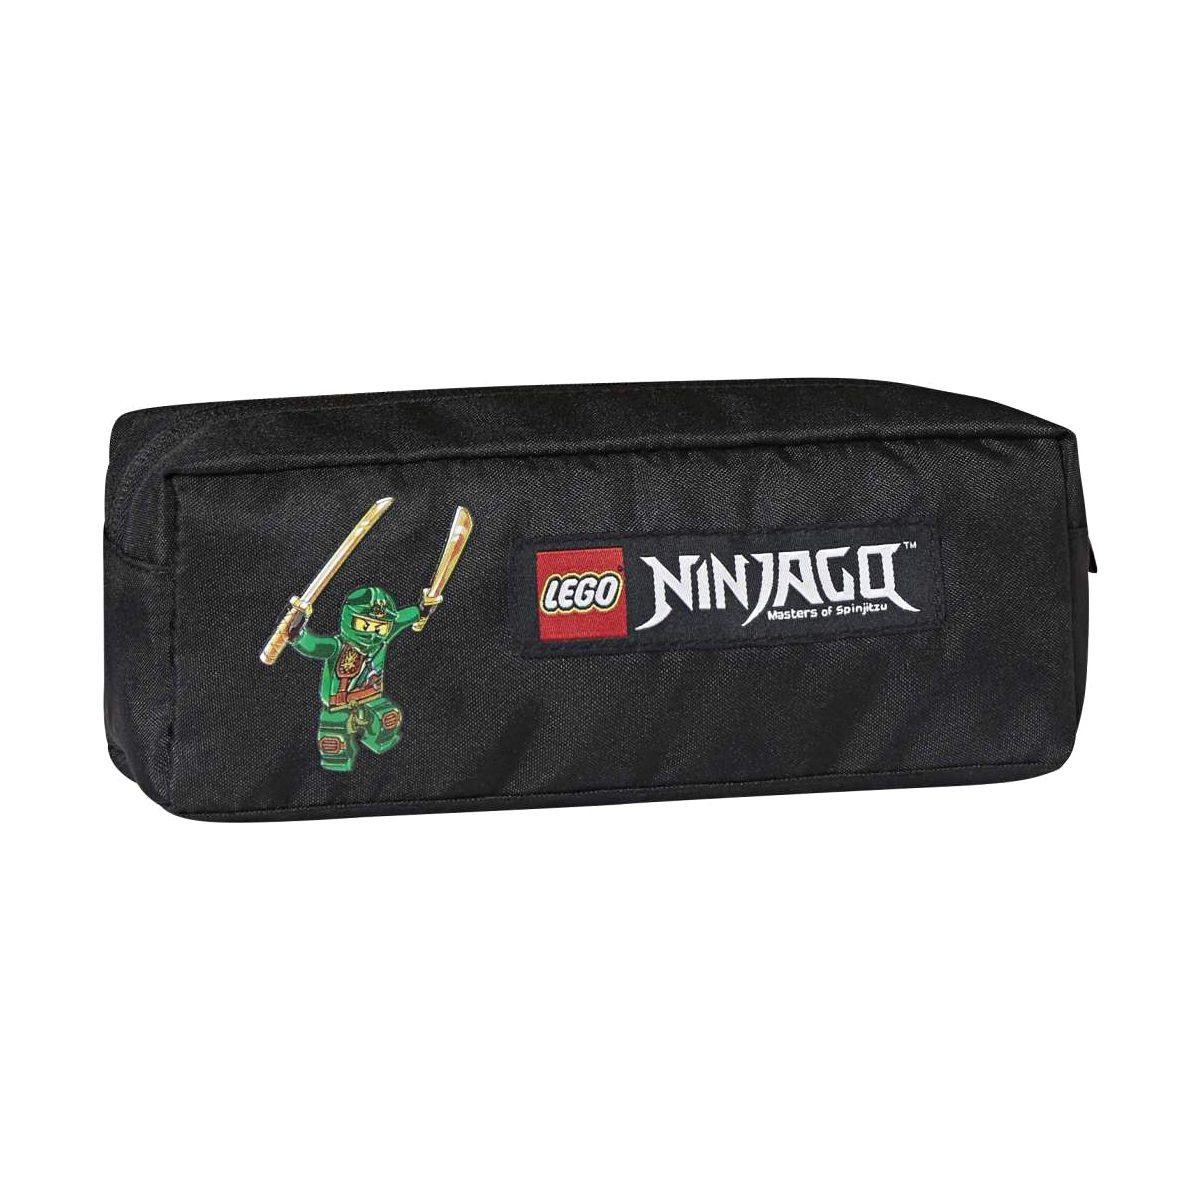 Penar Neechipat, NinjaGo Lloyd, V-Line, Verde, Lego, LG-10032-1707